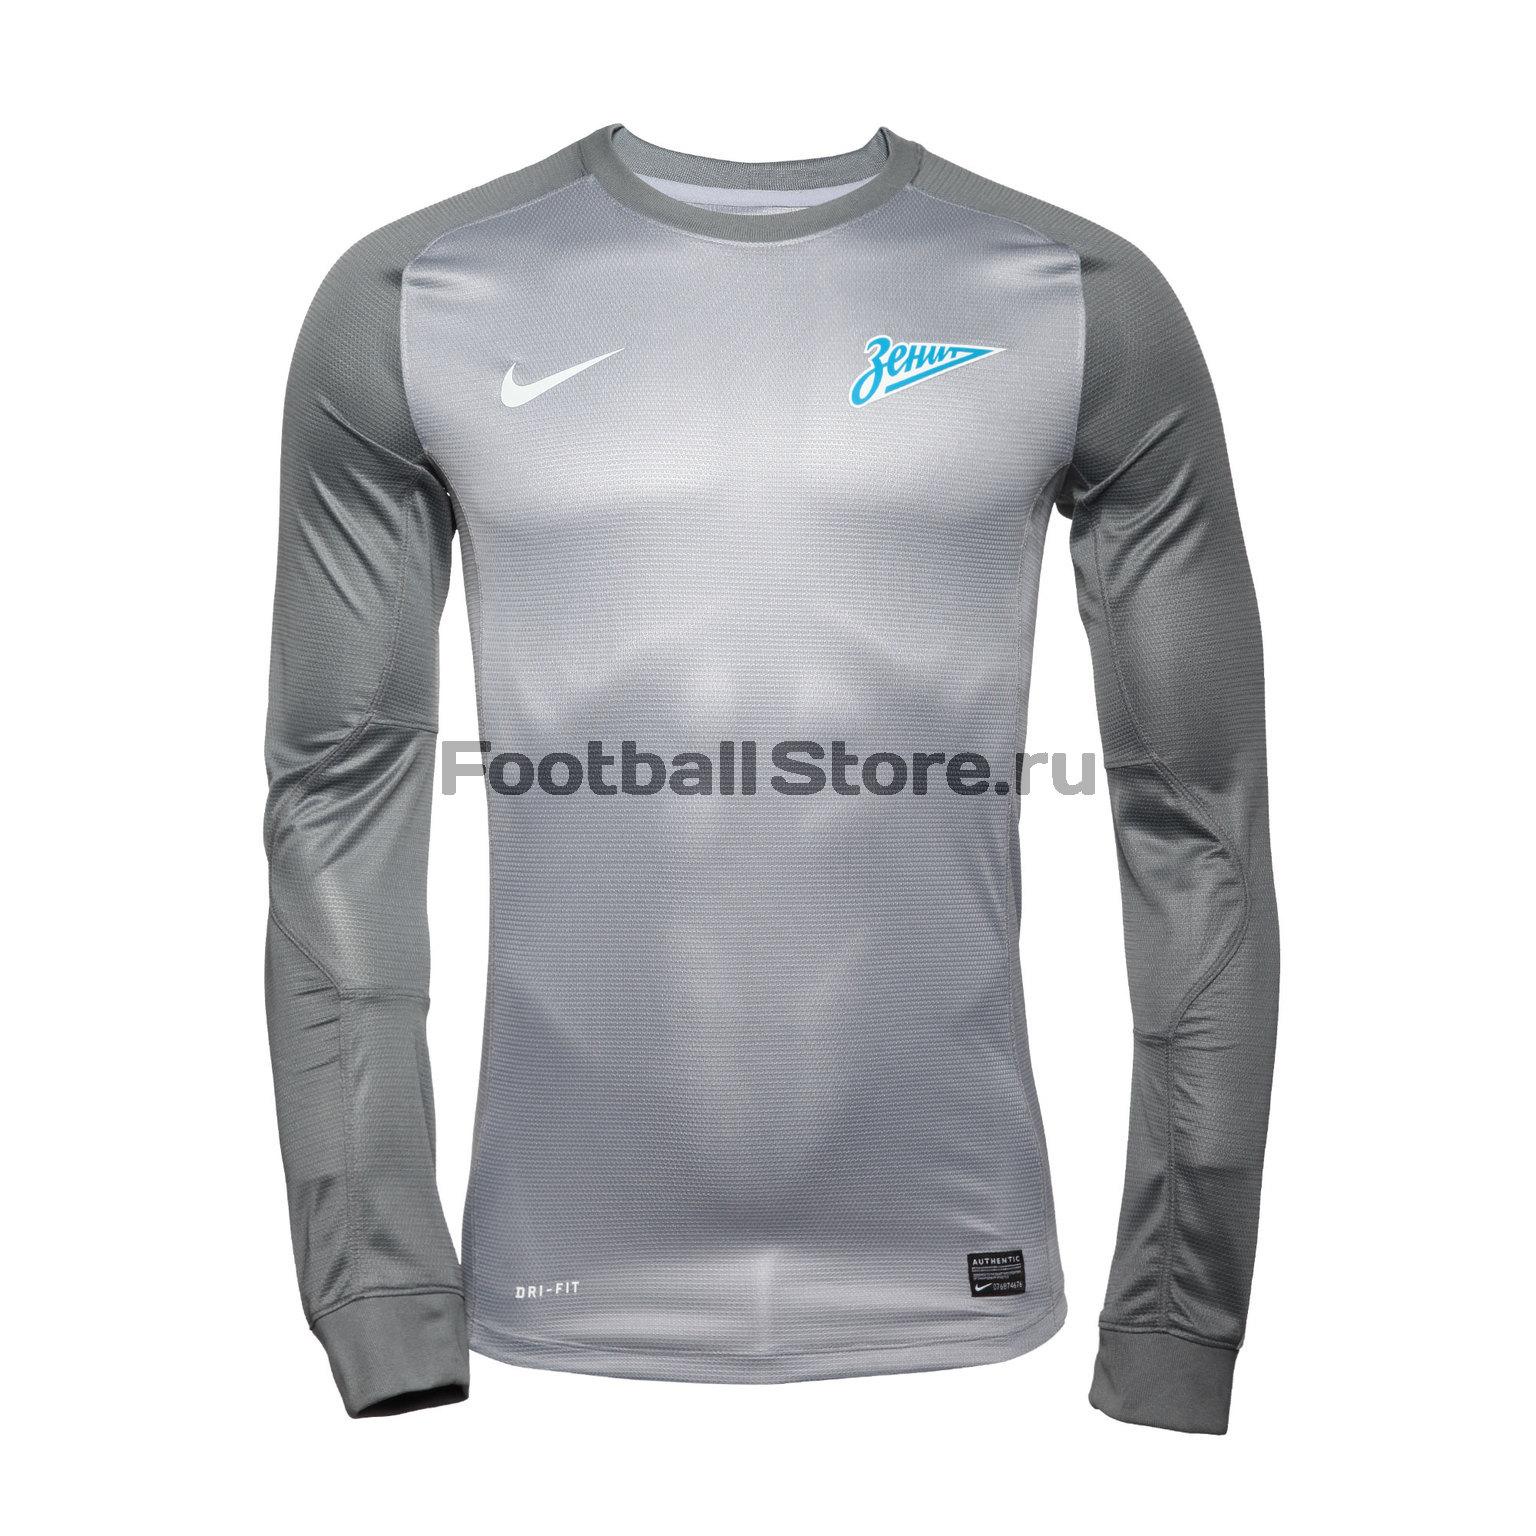 Zenit Nike Свитер вратарский Nike Zenit 540636-080